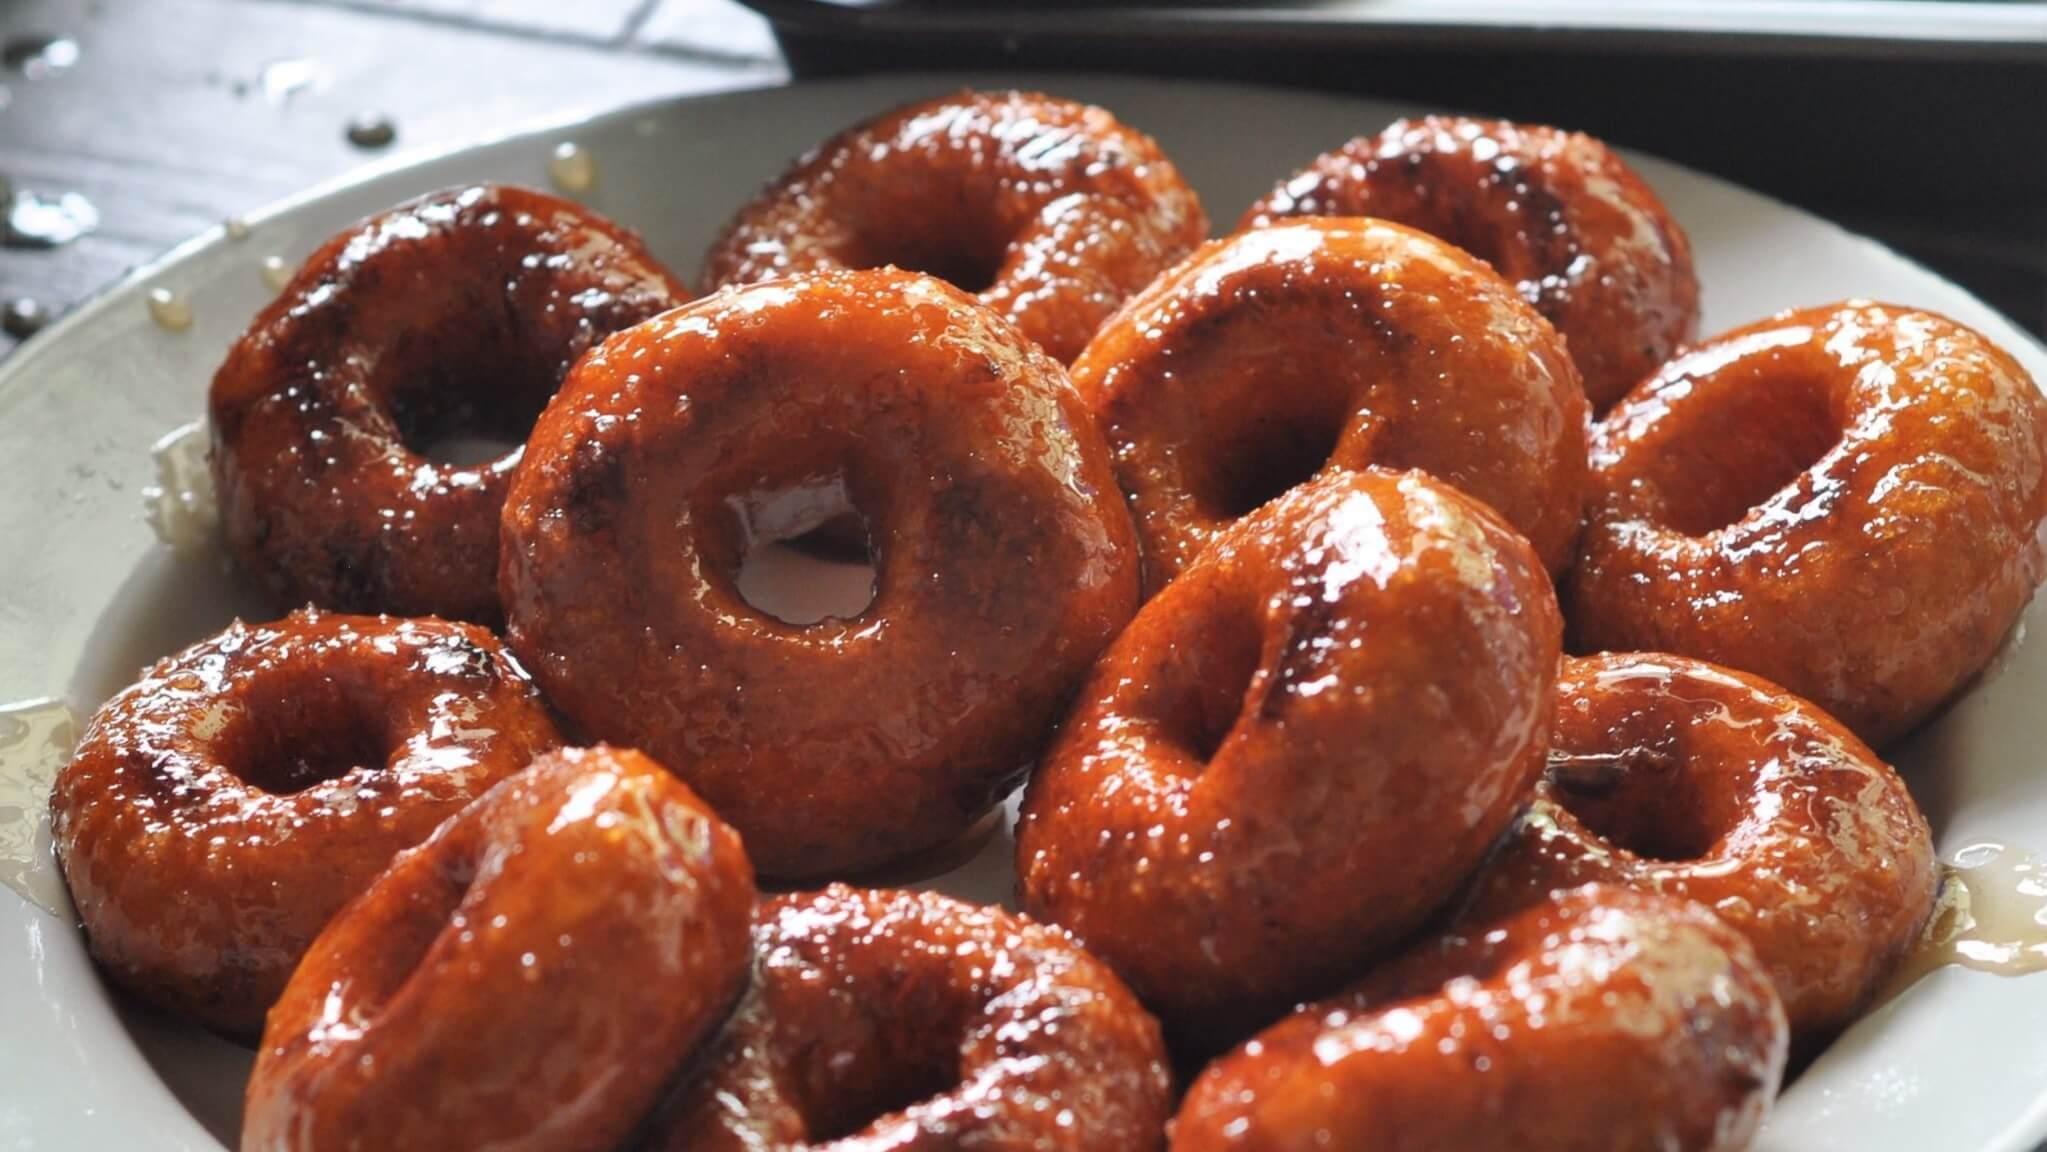 Homemade Hidden Sweet Potato Vegan Donuts